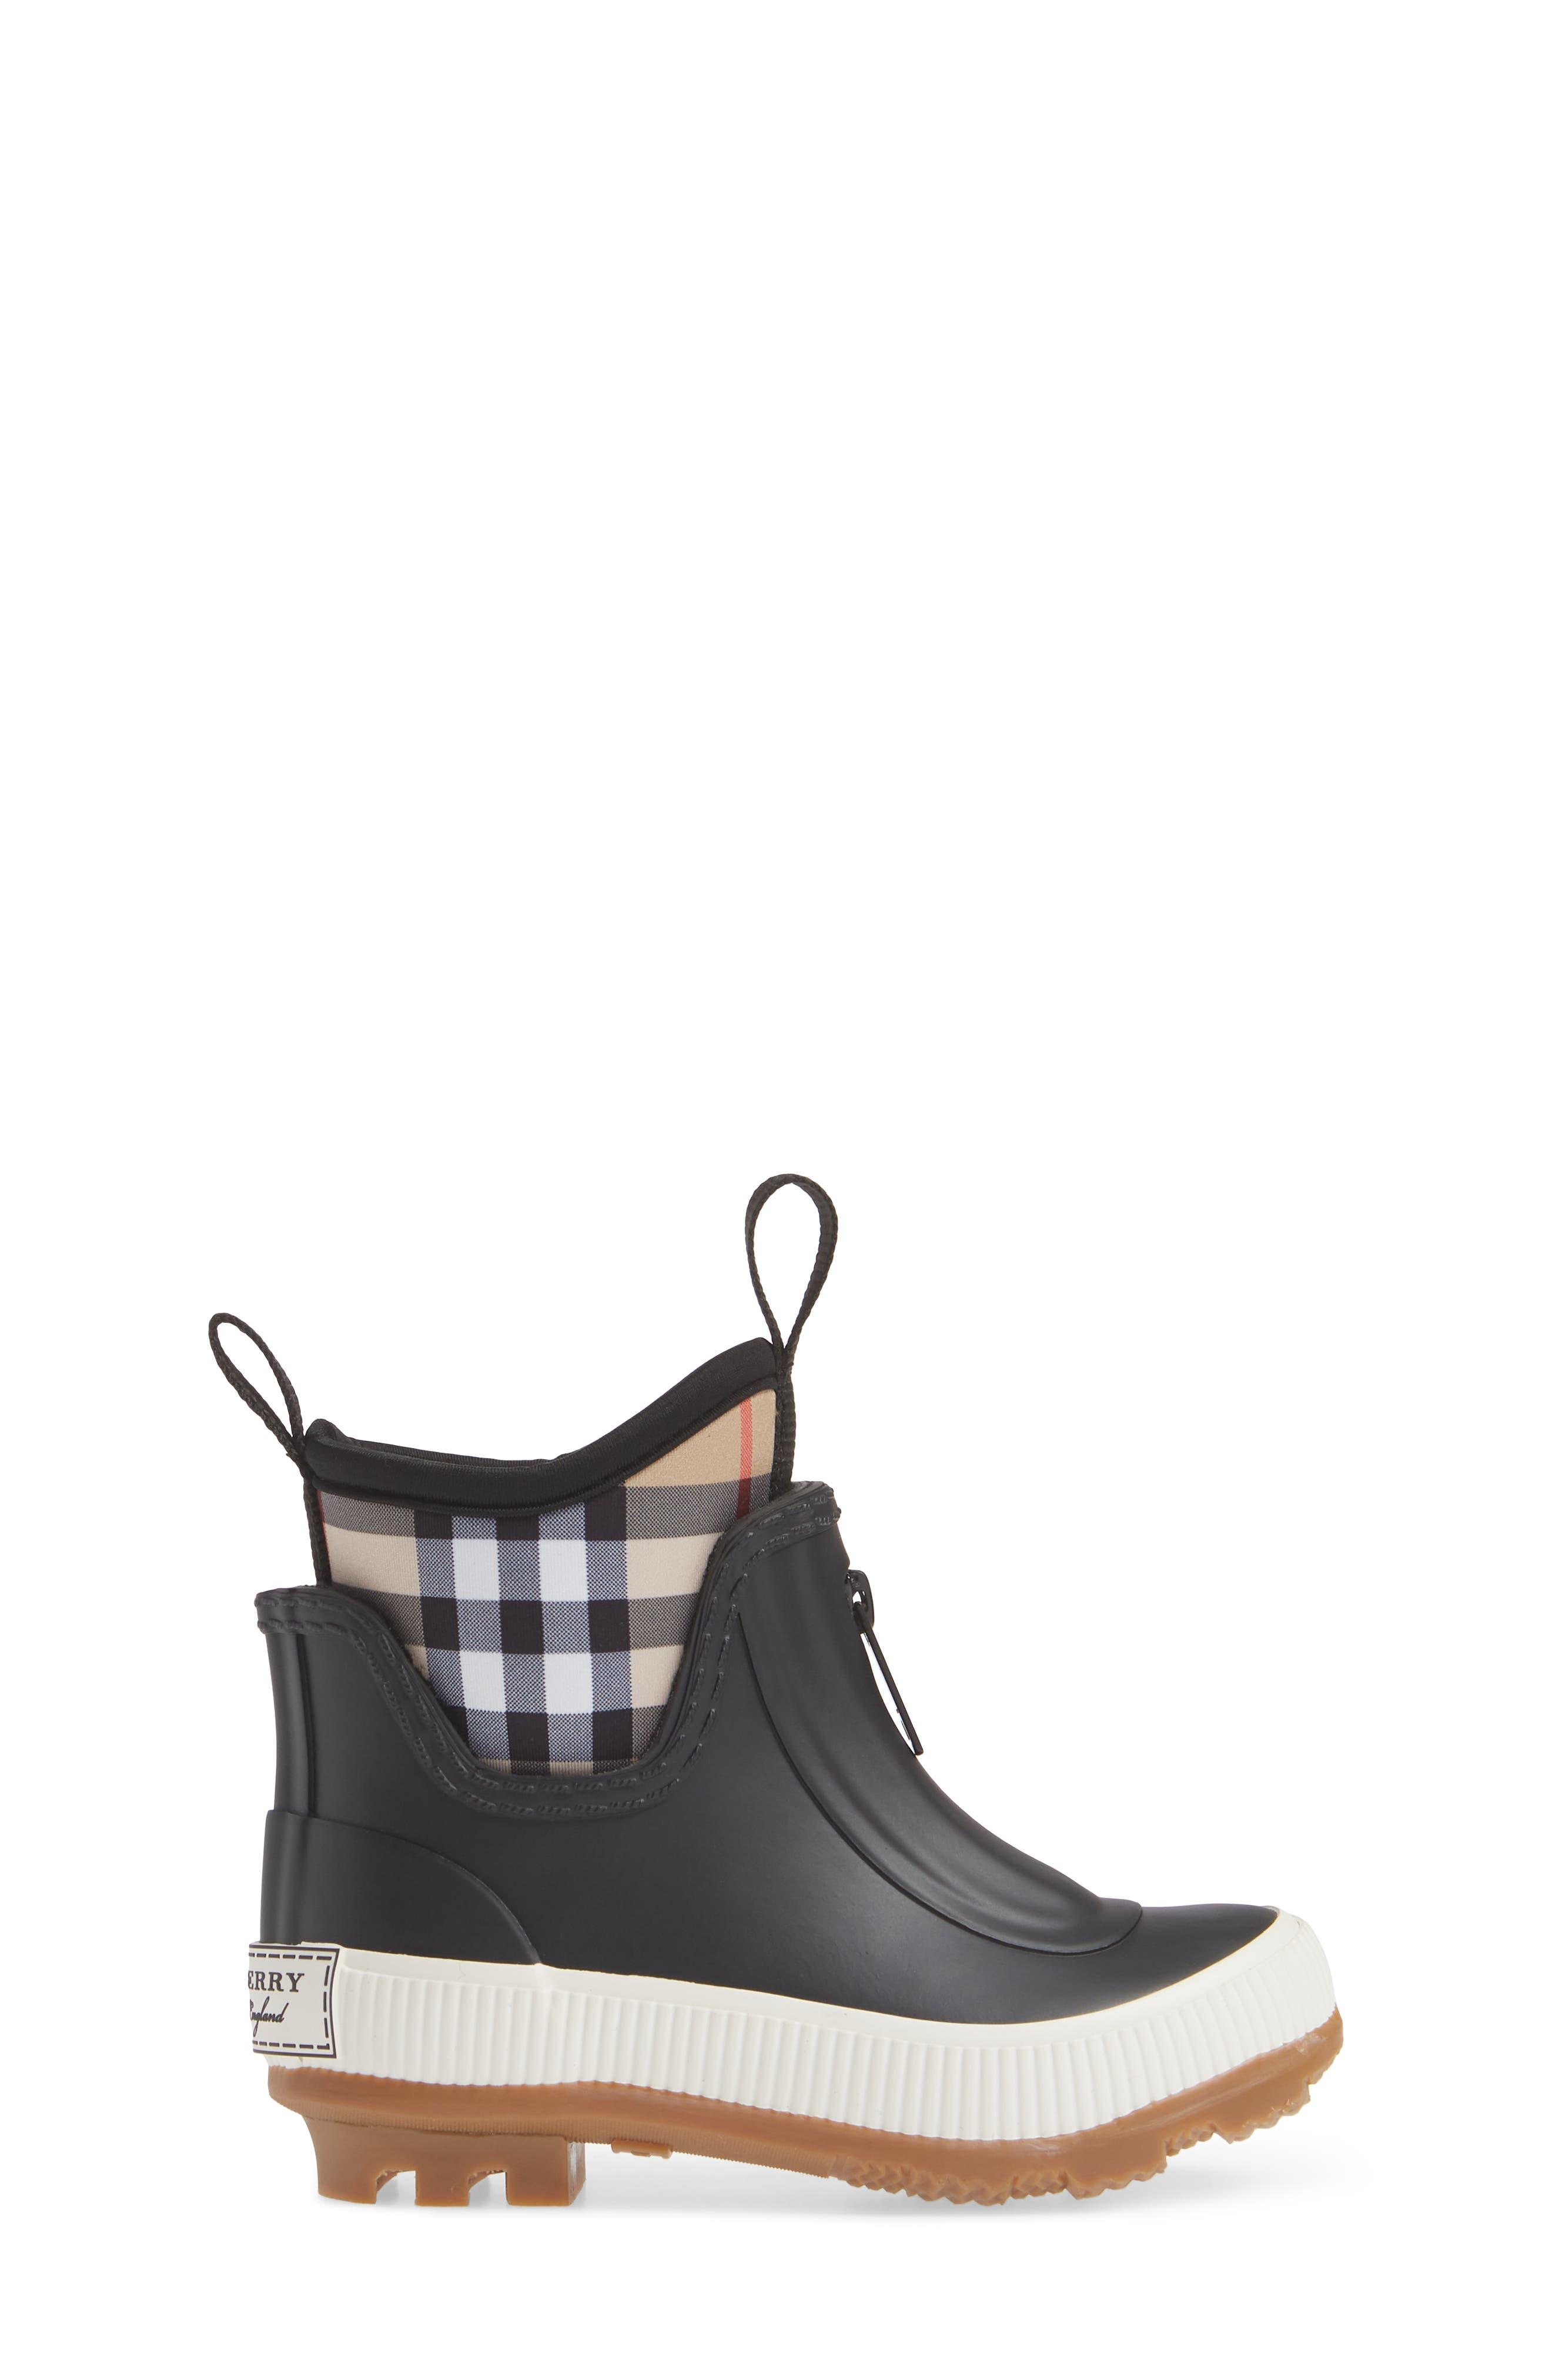 BURBERRY, Flinton Waterproof Rain Boot, Alternate thumbnail 3, color, BLACK